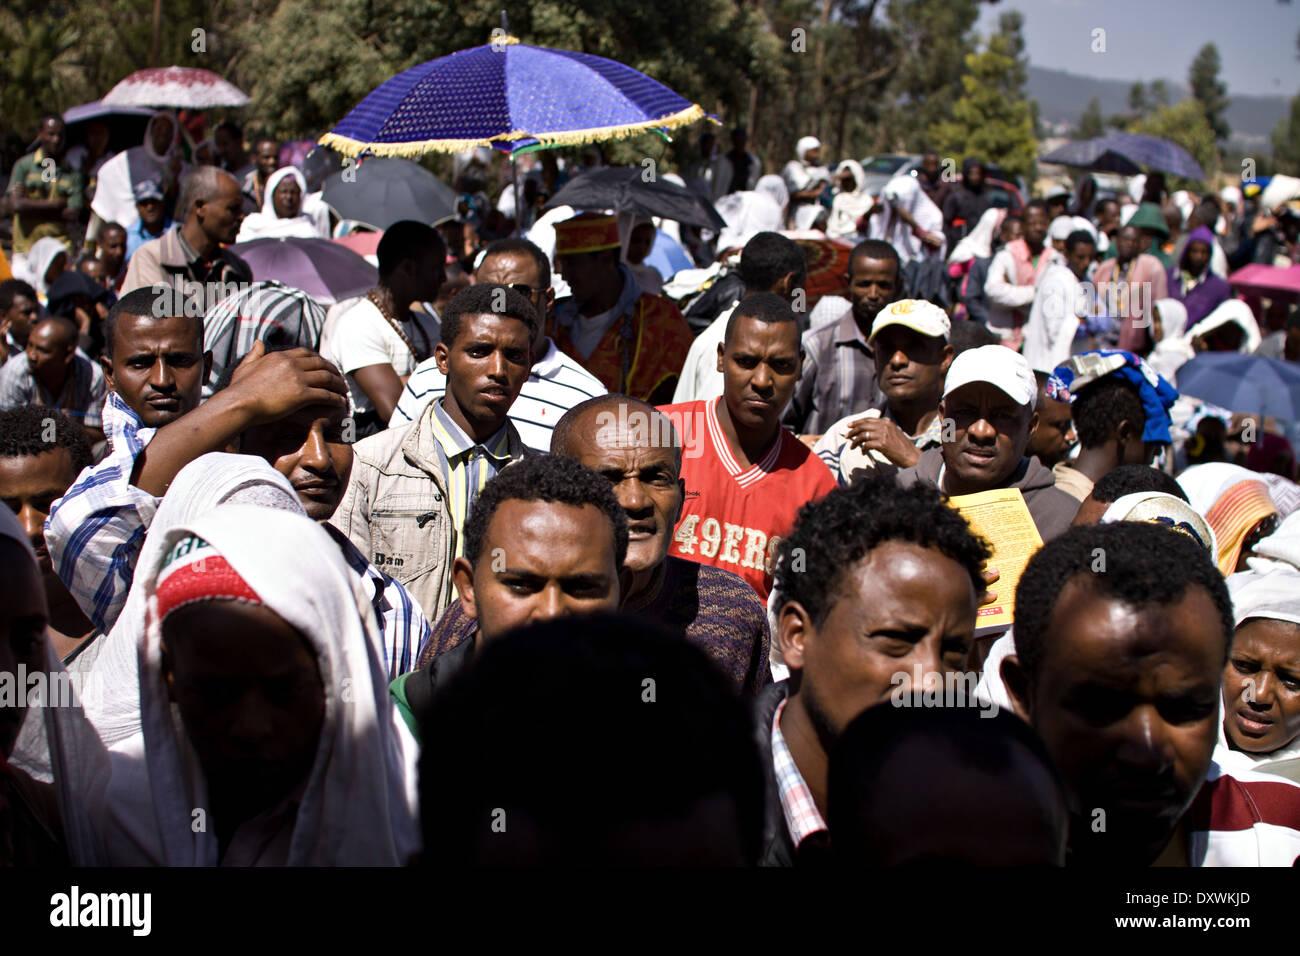 Ethiopians, Africans - Stock Image